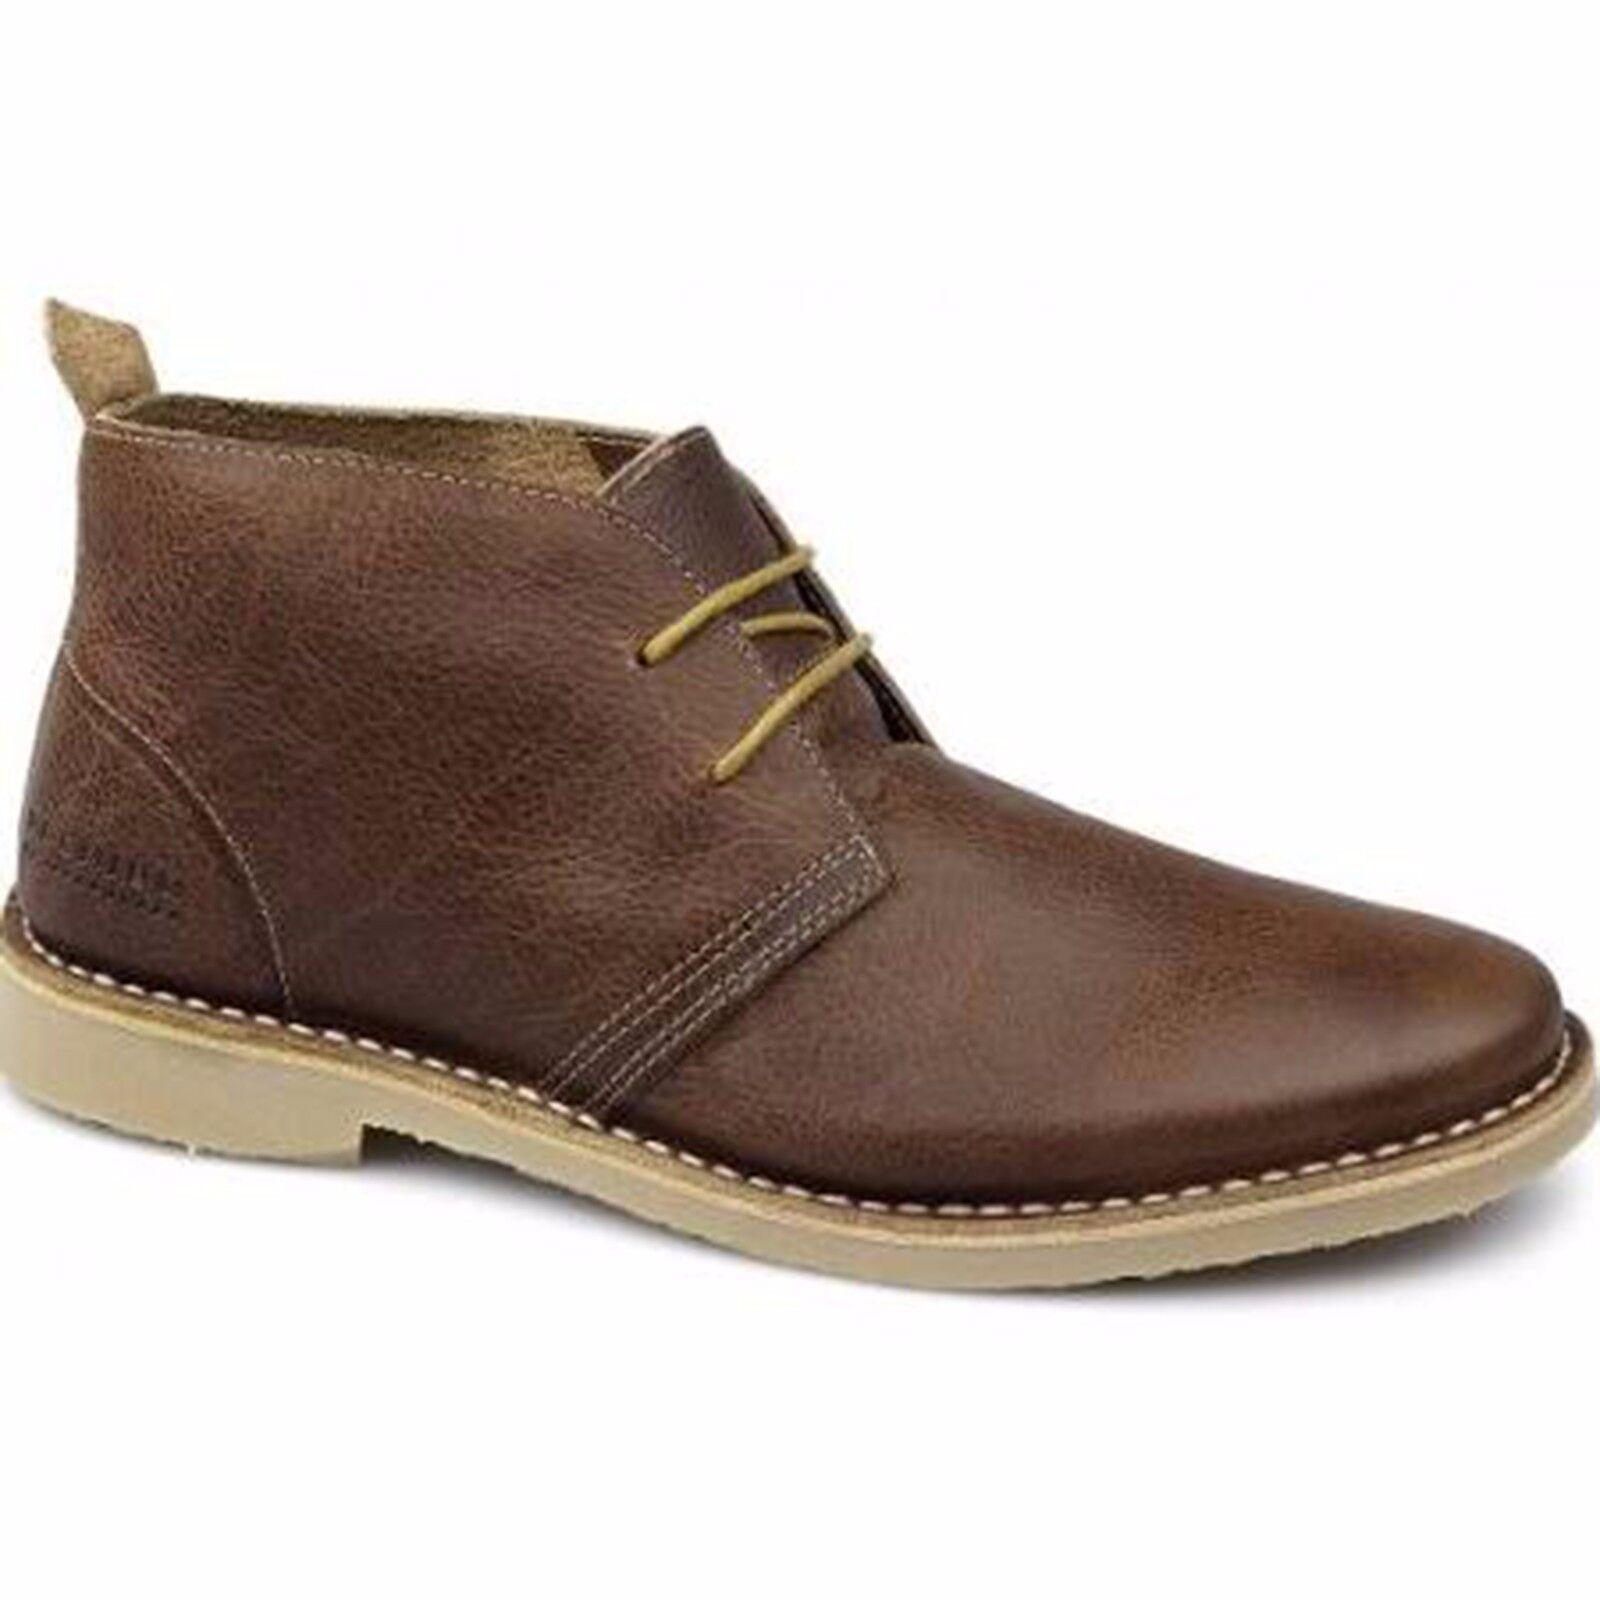 Jack and Jones Gobi Gobi Jones Warm Lining Leather Brown Desert Boots 6da8ab